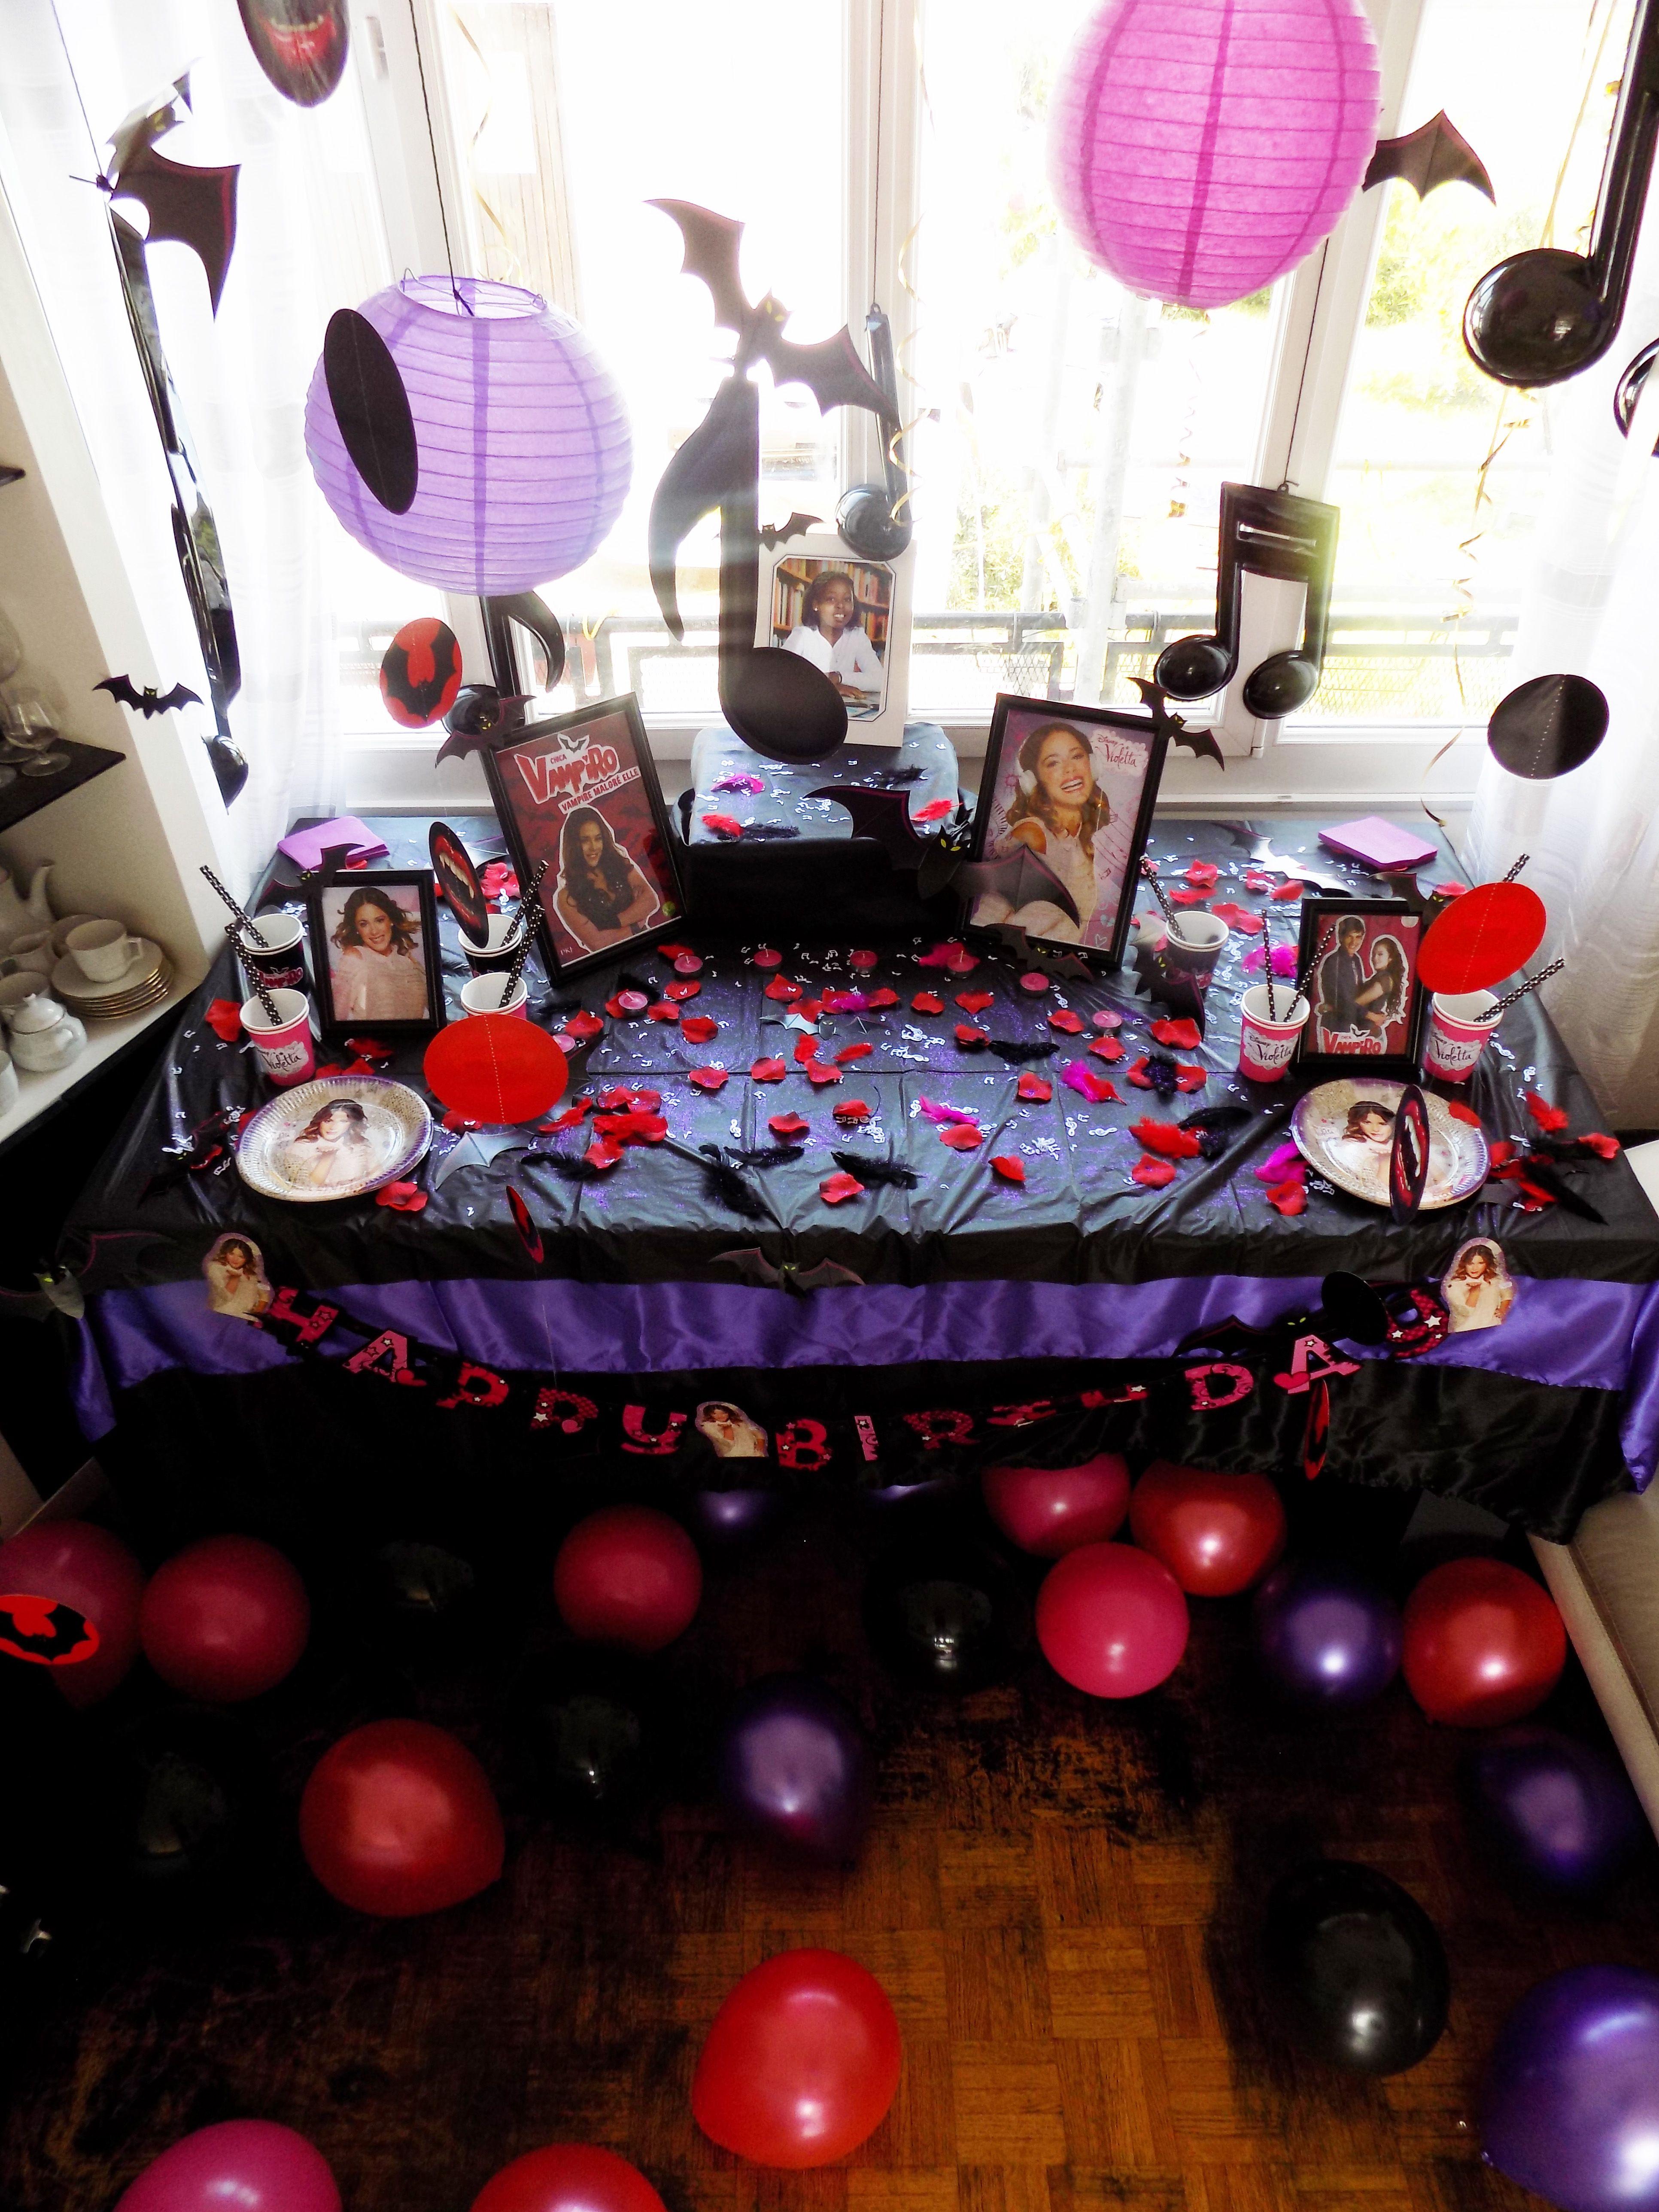 Décoration anniversaire thème Chica Vampiro vs Violetta avec KYOKO